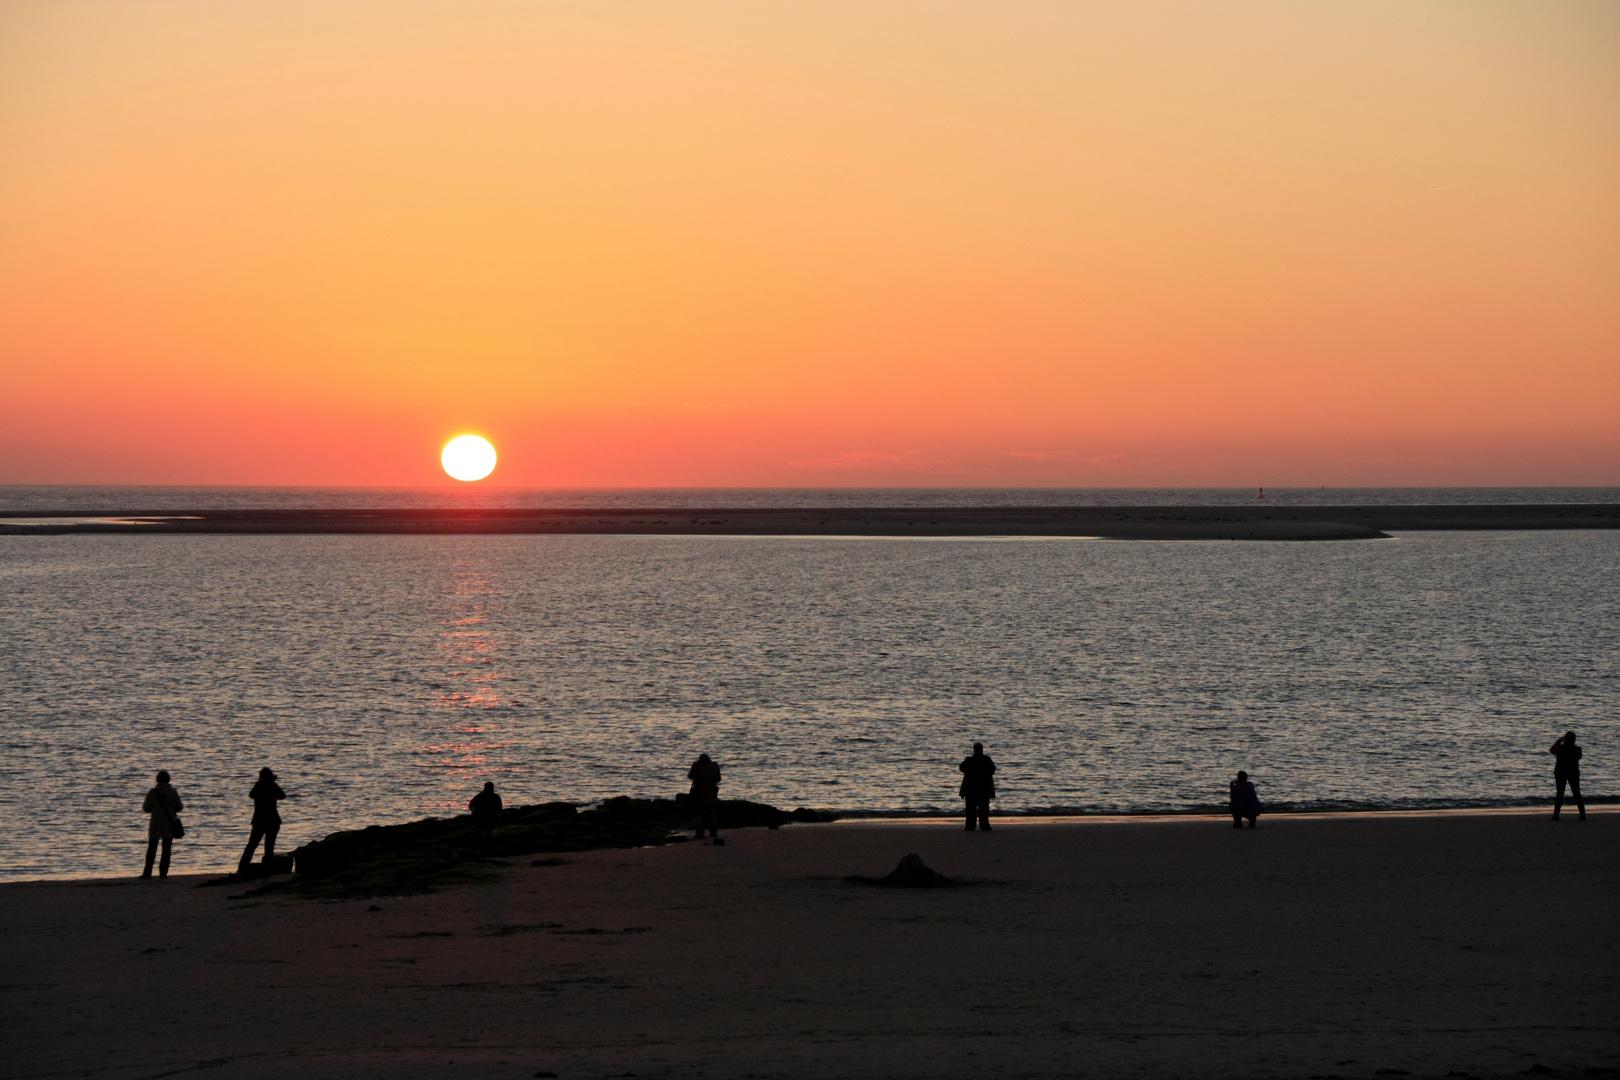 Sonnenuntergang fotografieren...